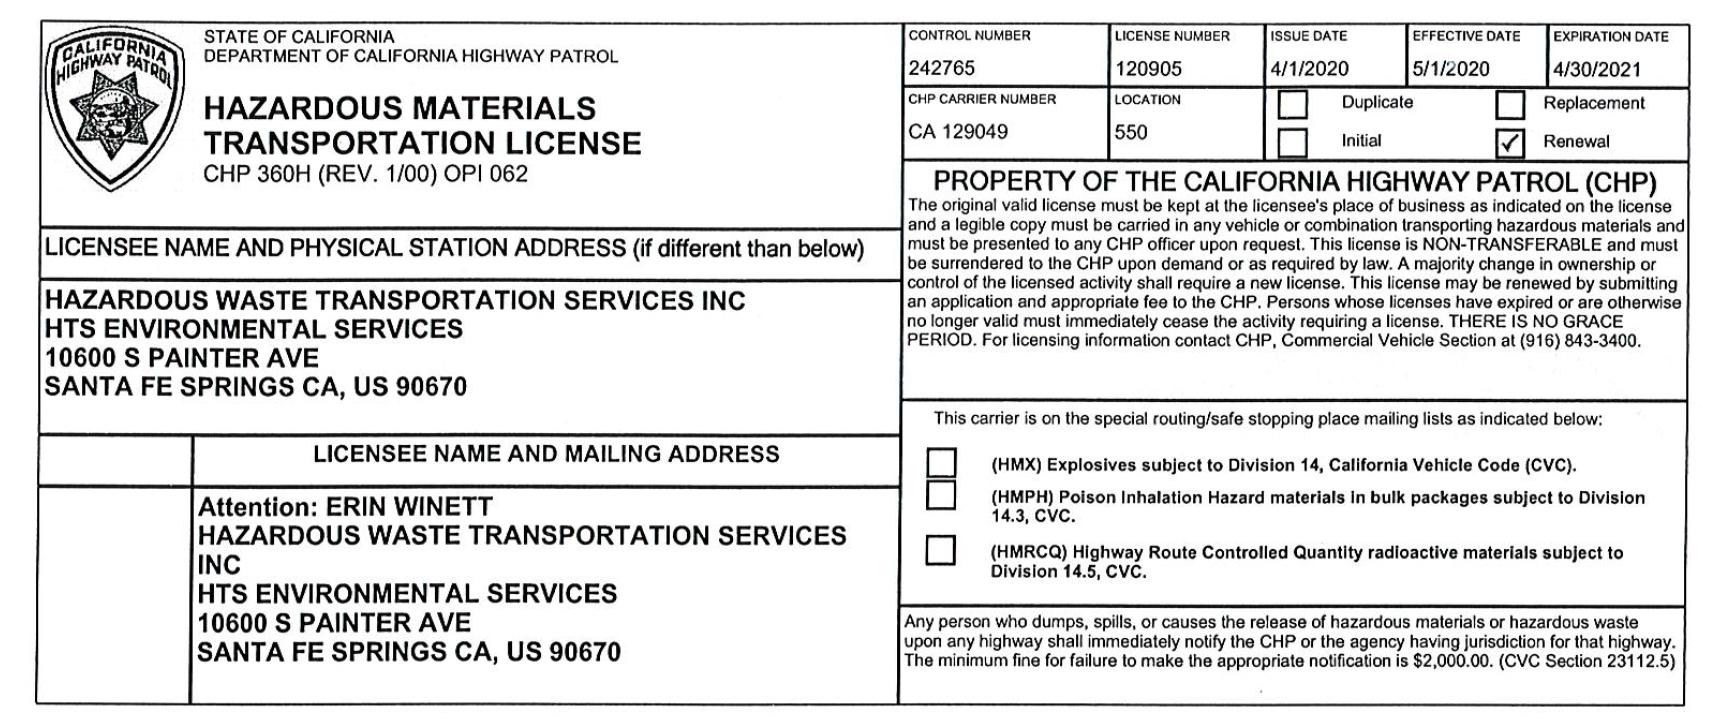 hazardous materials permits insurance license certificate registration phmsa usdot waste transportation